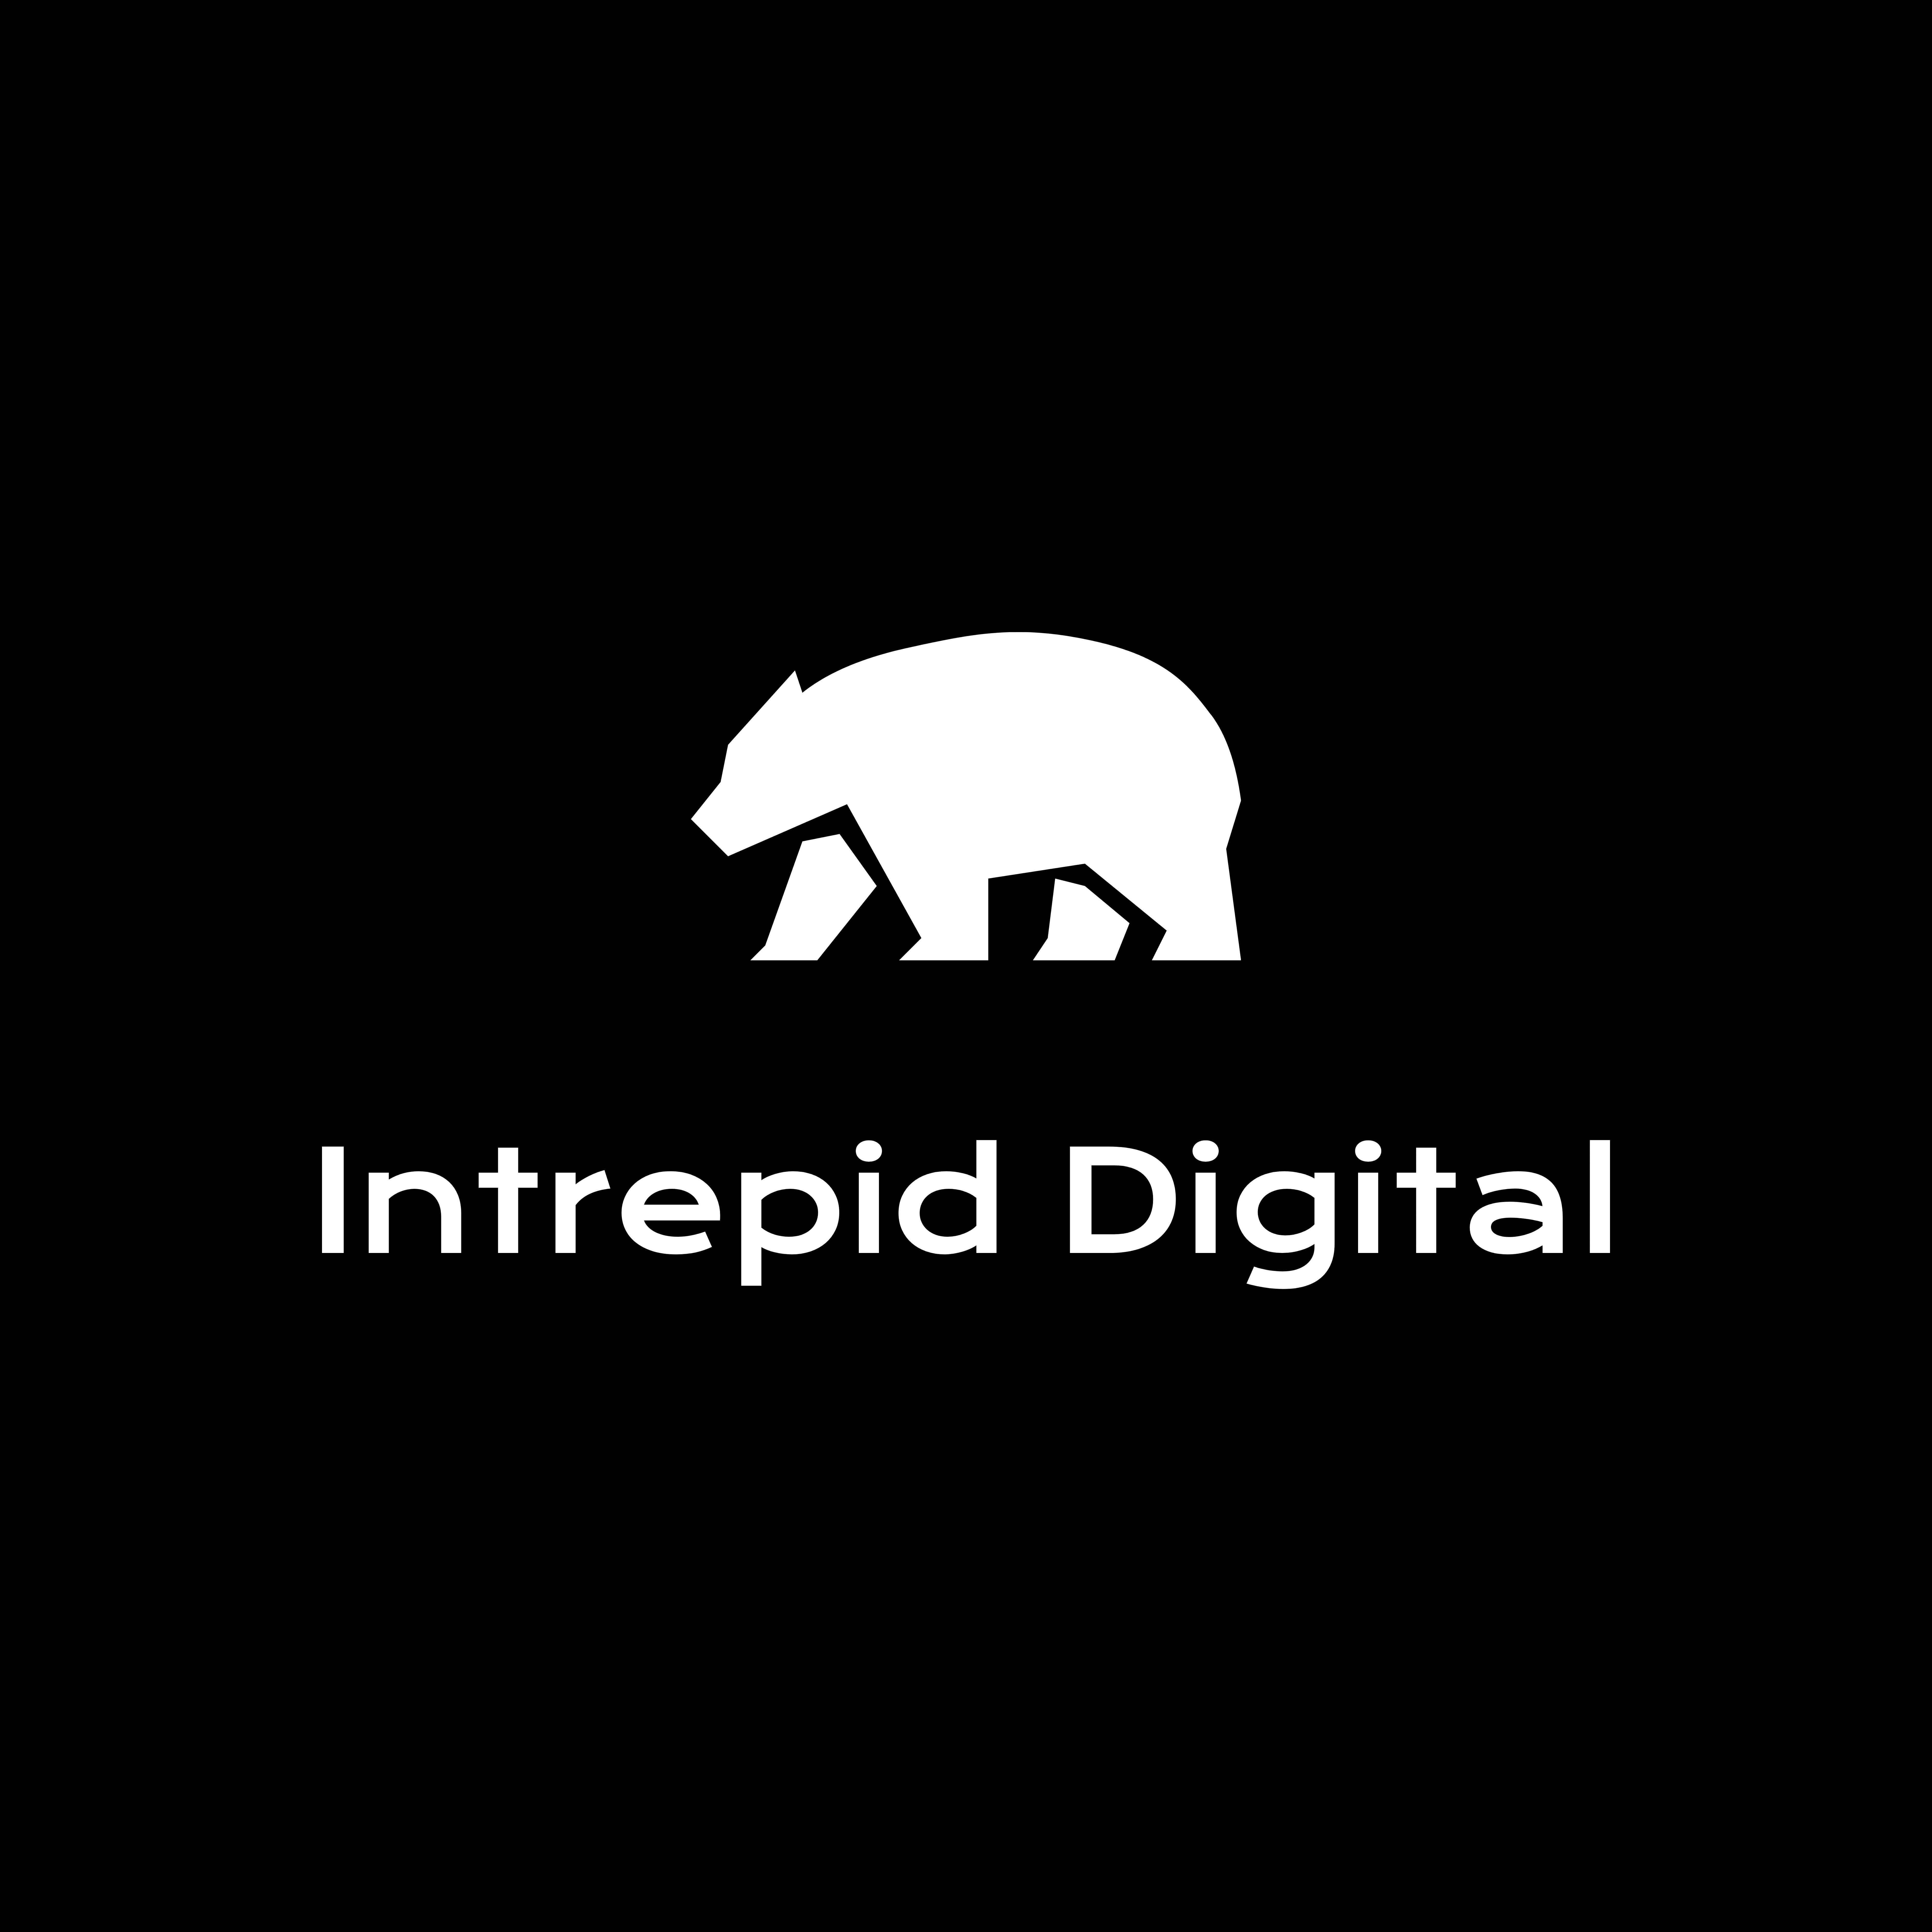 Intrepid Digital